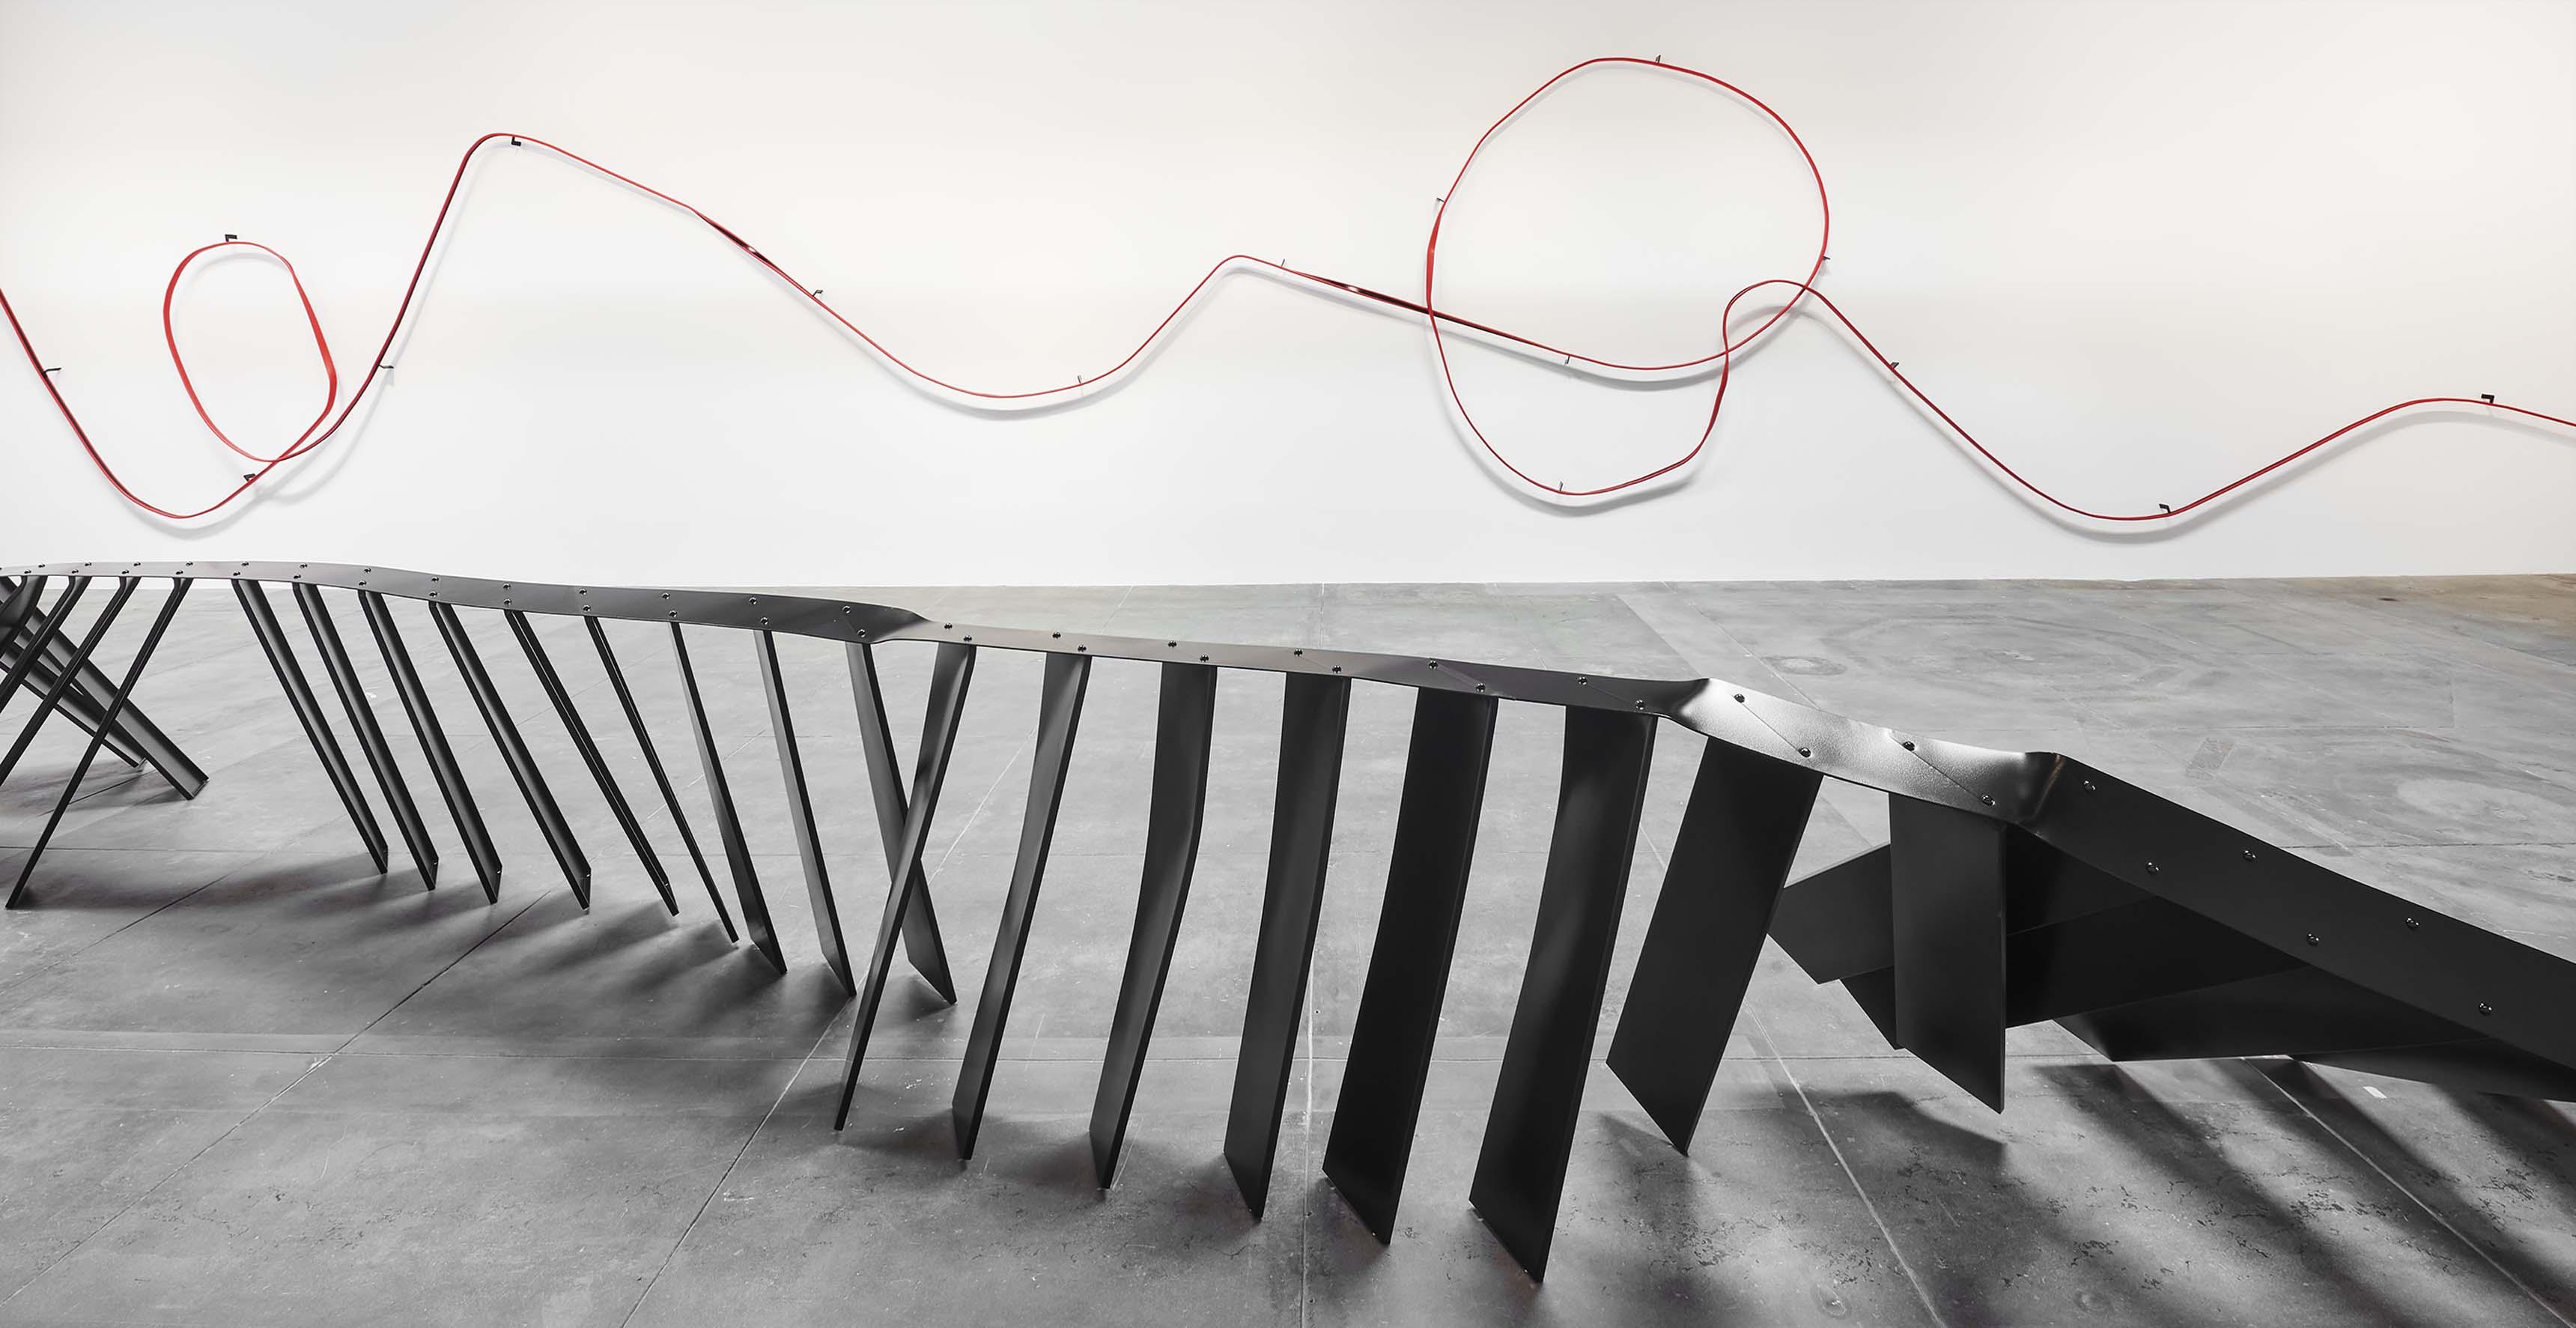 Installation view, 'Monika Sosnowska', Hauser & Wirth Los Angeles, 2017 © Monika Sosnowska Courtesy the artist and Hauser & Wirth Photo: Mario de Lopez